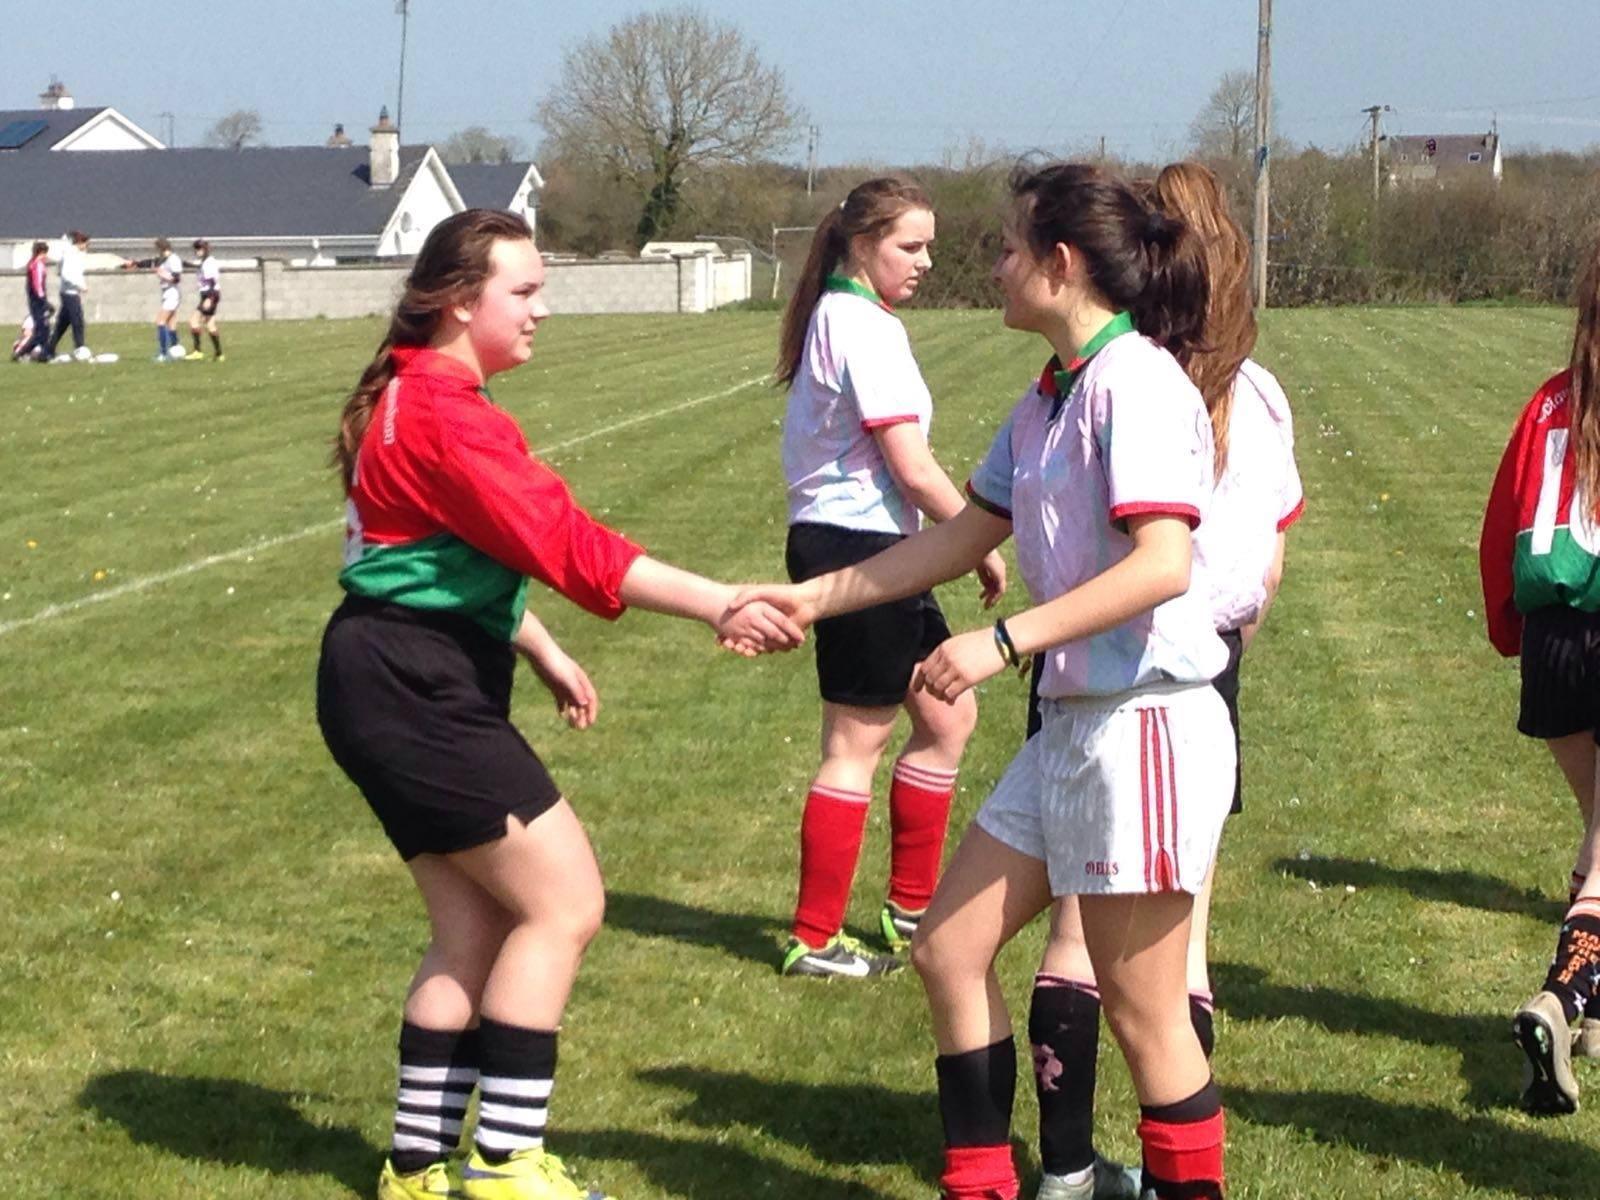 20th April 2016: Active Wednesday of Active Schools Week 2016 at Desmond College: Girls Soccer Match. Desmond College Won 2-1 vs Pallaskenry